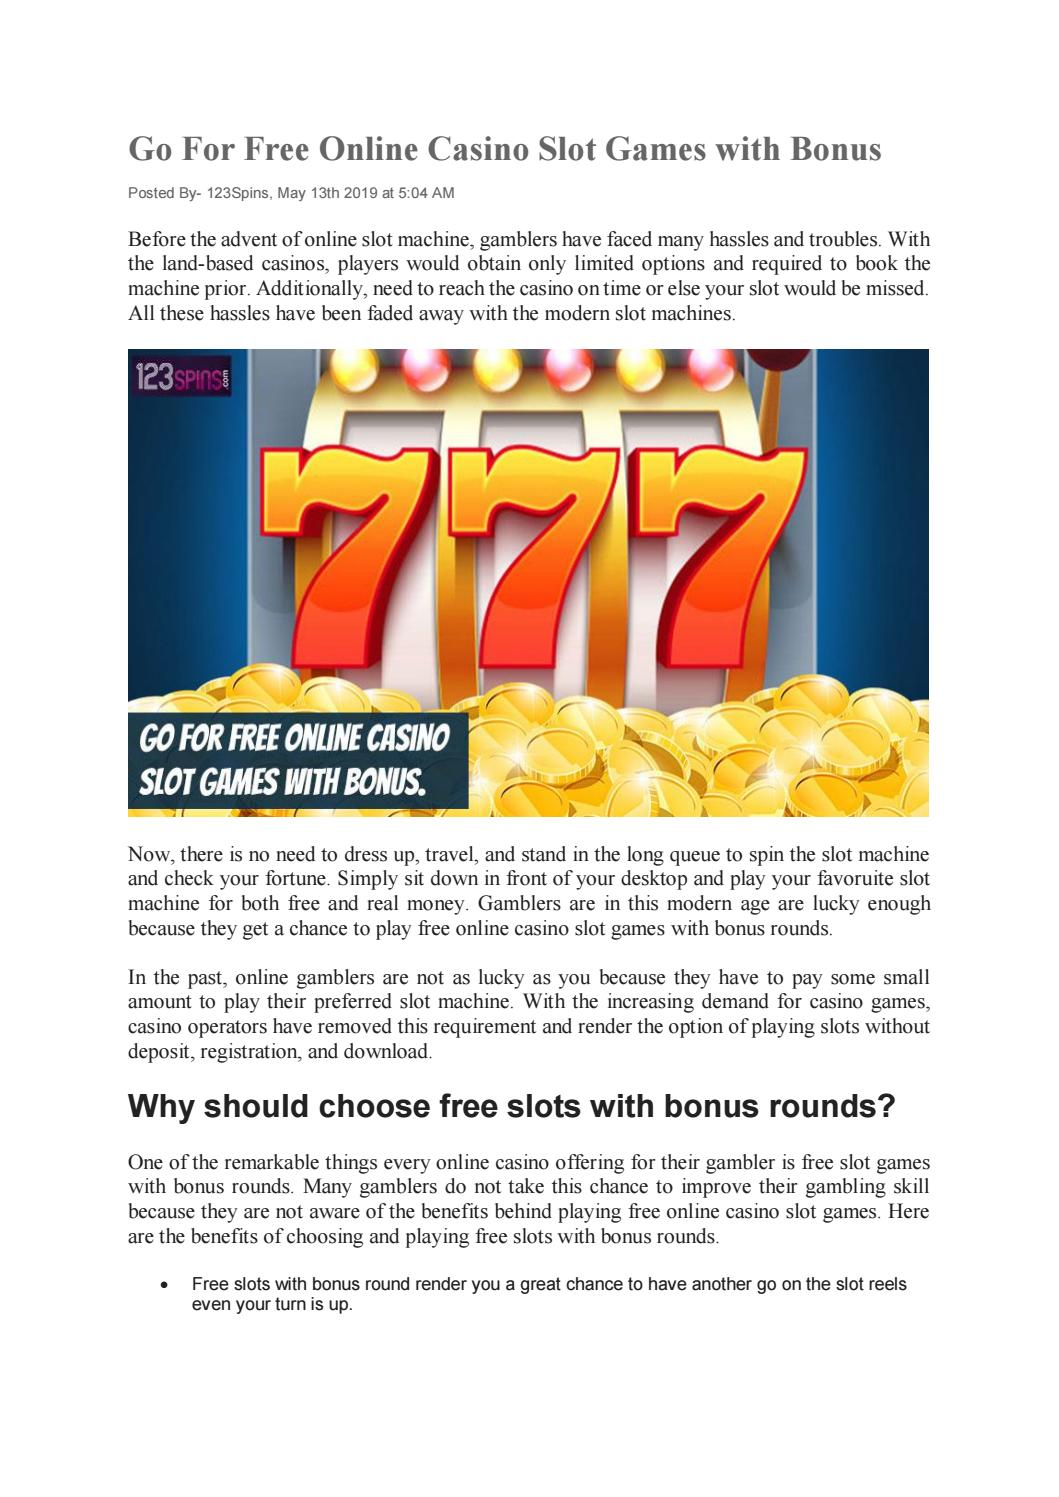 Бонус казино онлайн бесплатно он лайн игровые автоматы